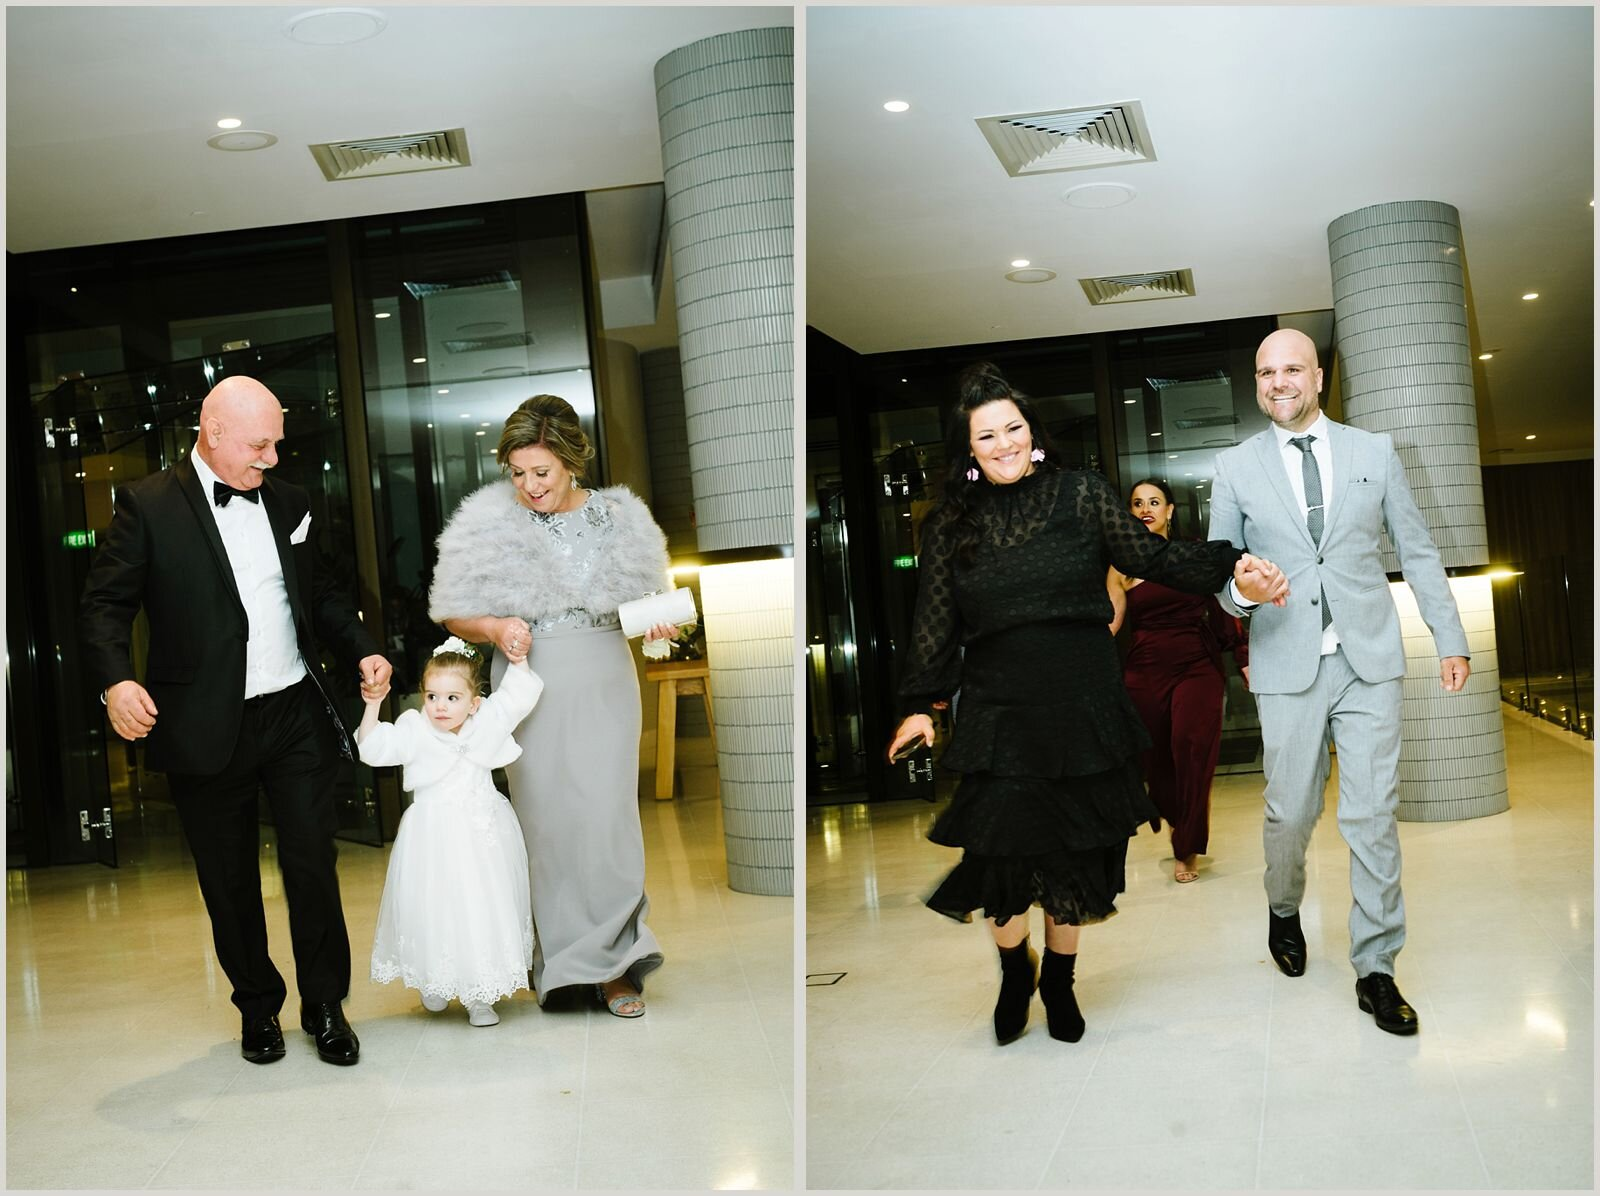 joseph_koprek_wedding_melbourne_the_prince_deck_0074.jpg